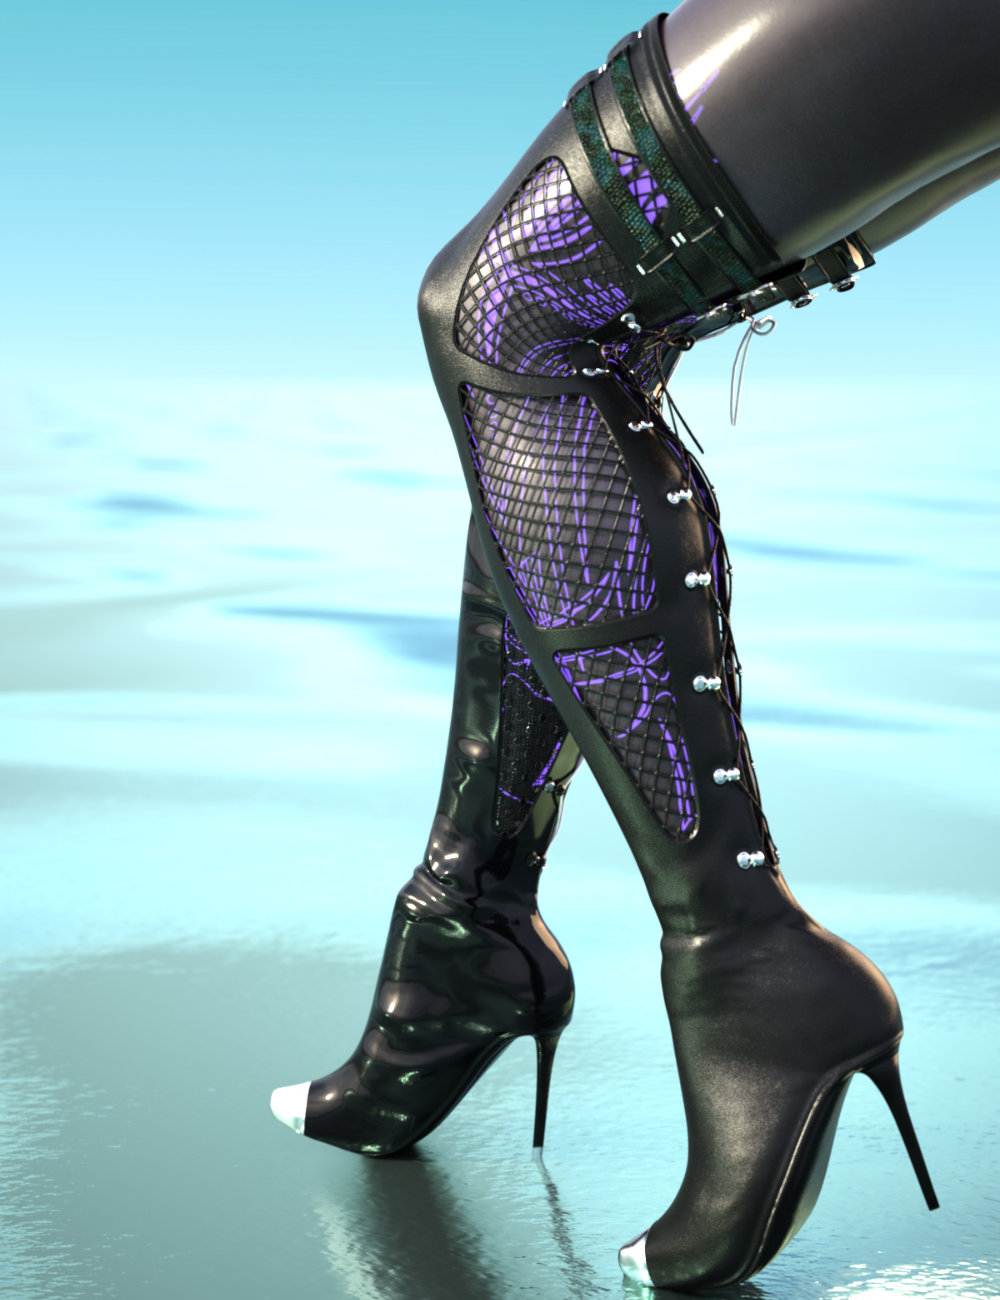 Drow Mercenary Boots for Genesis 8 Females by: SWTrium, 3D Models by Daz 3D